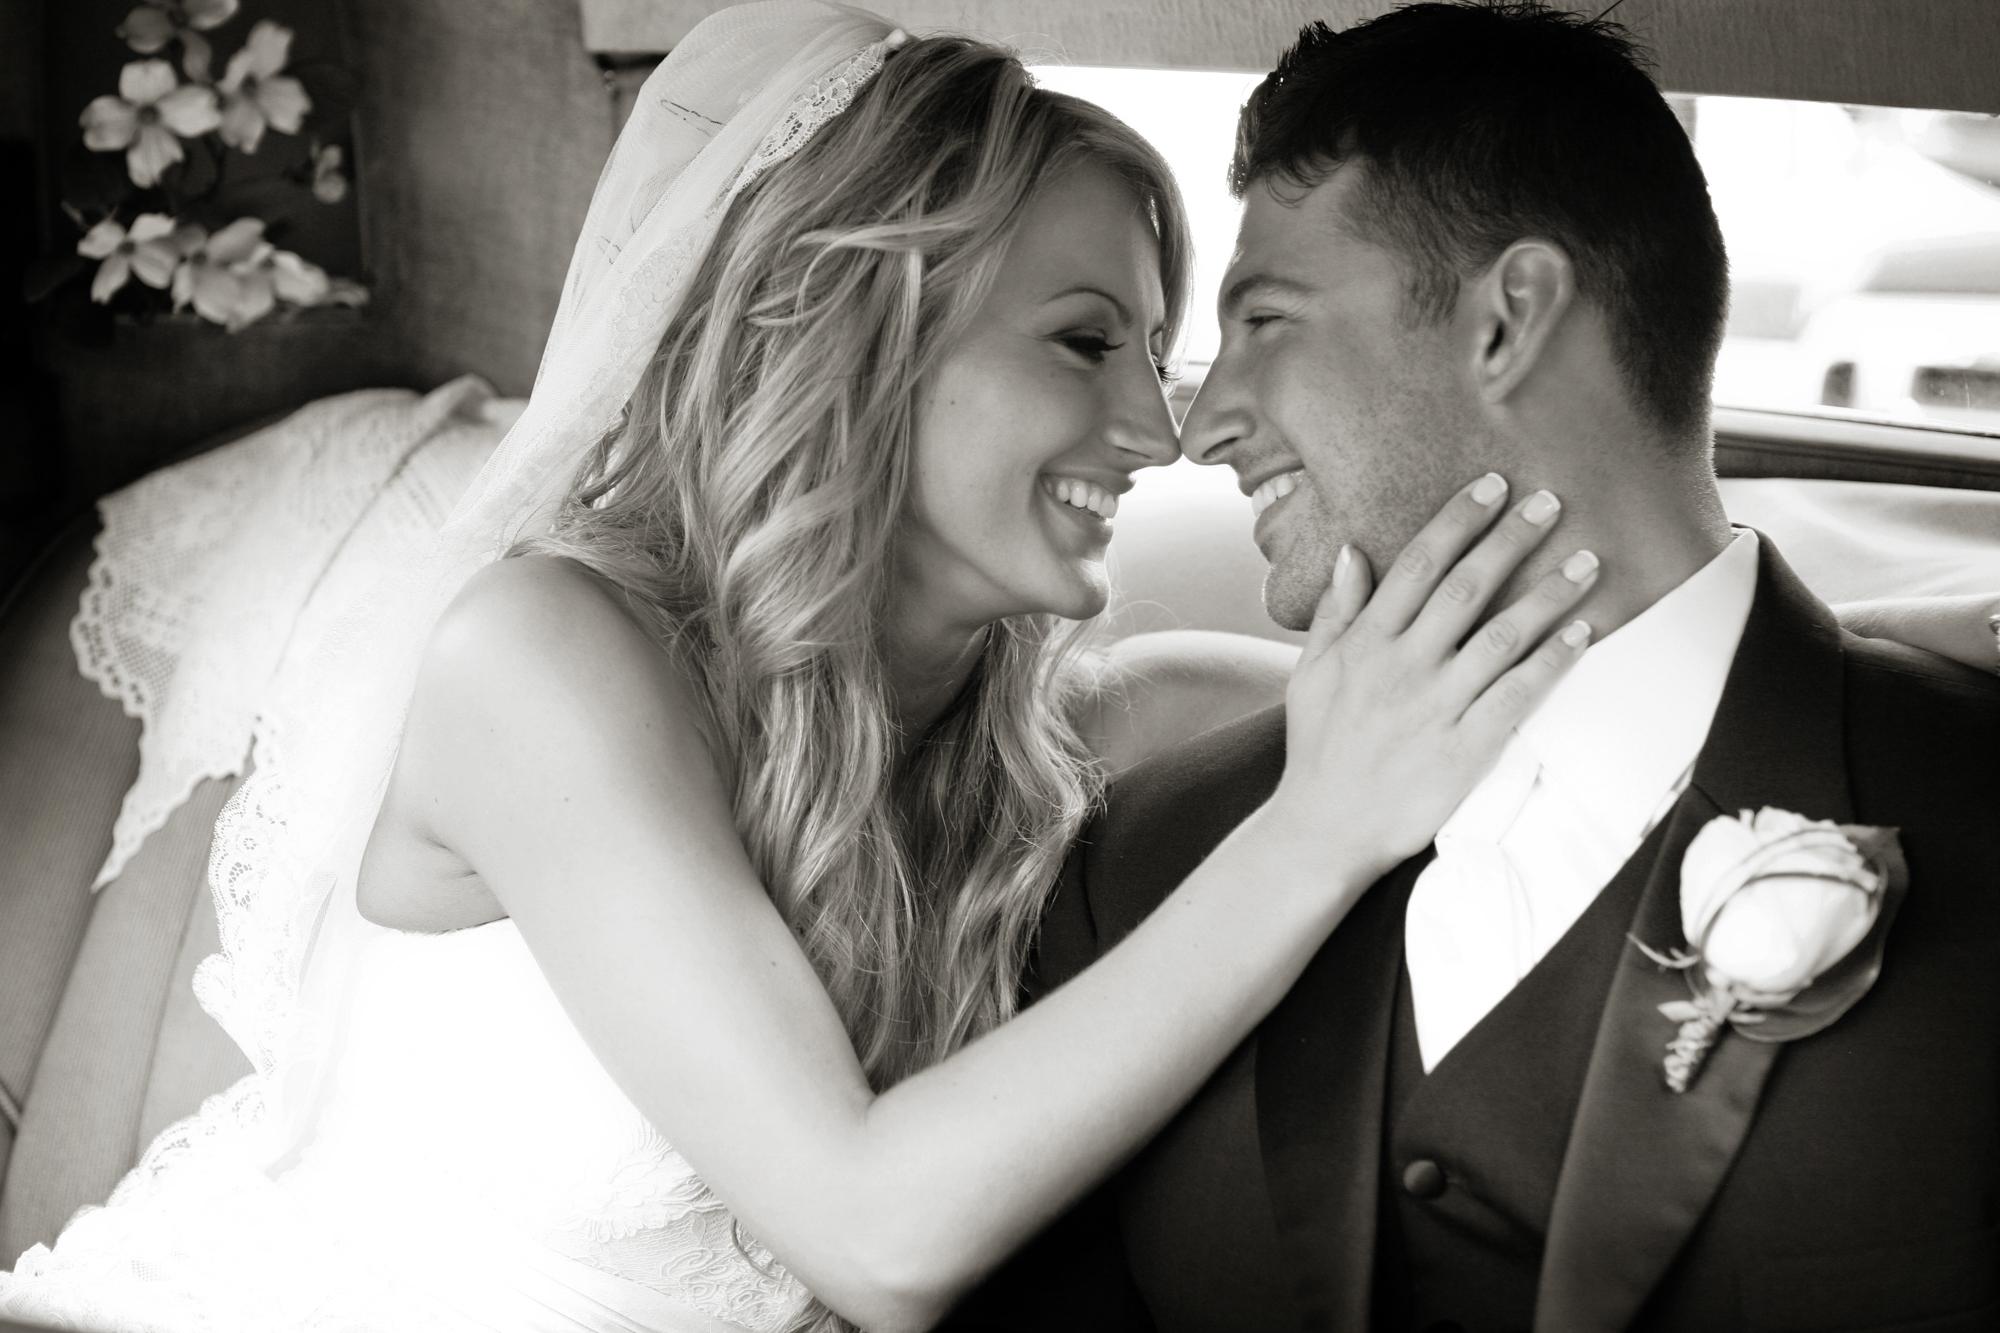 vancouver-luxury-wedding-photographer-lori-miles-001.jpg